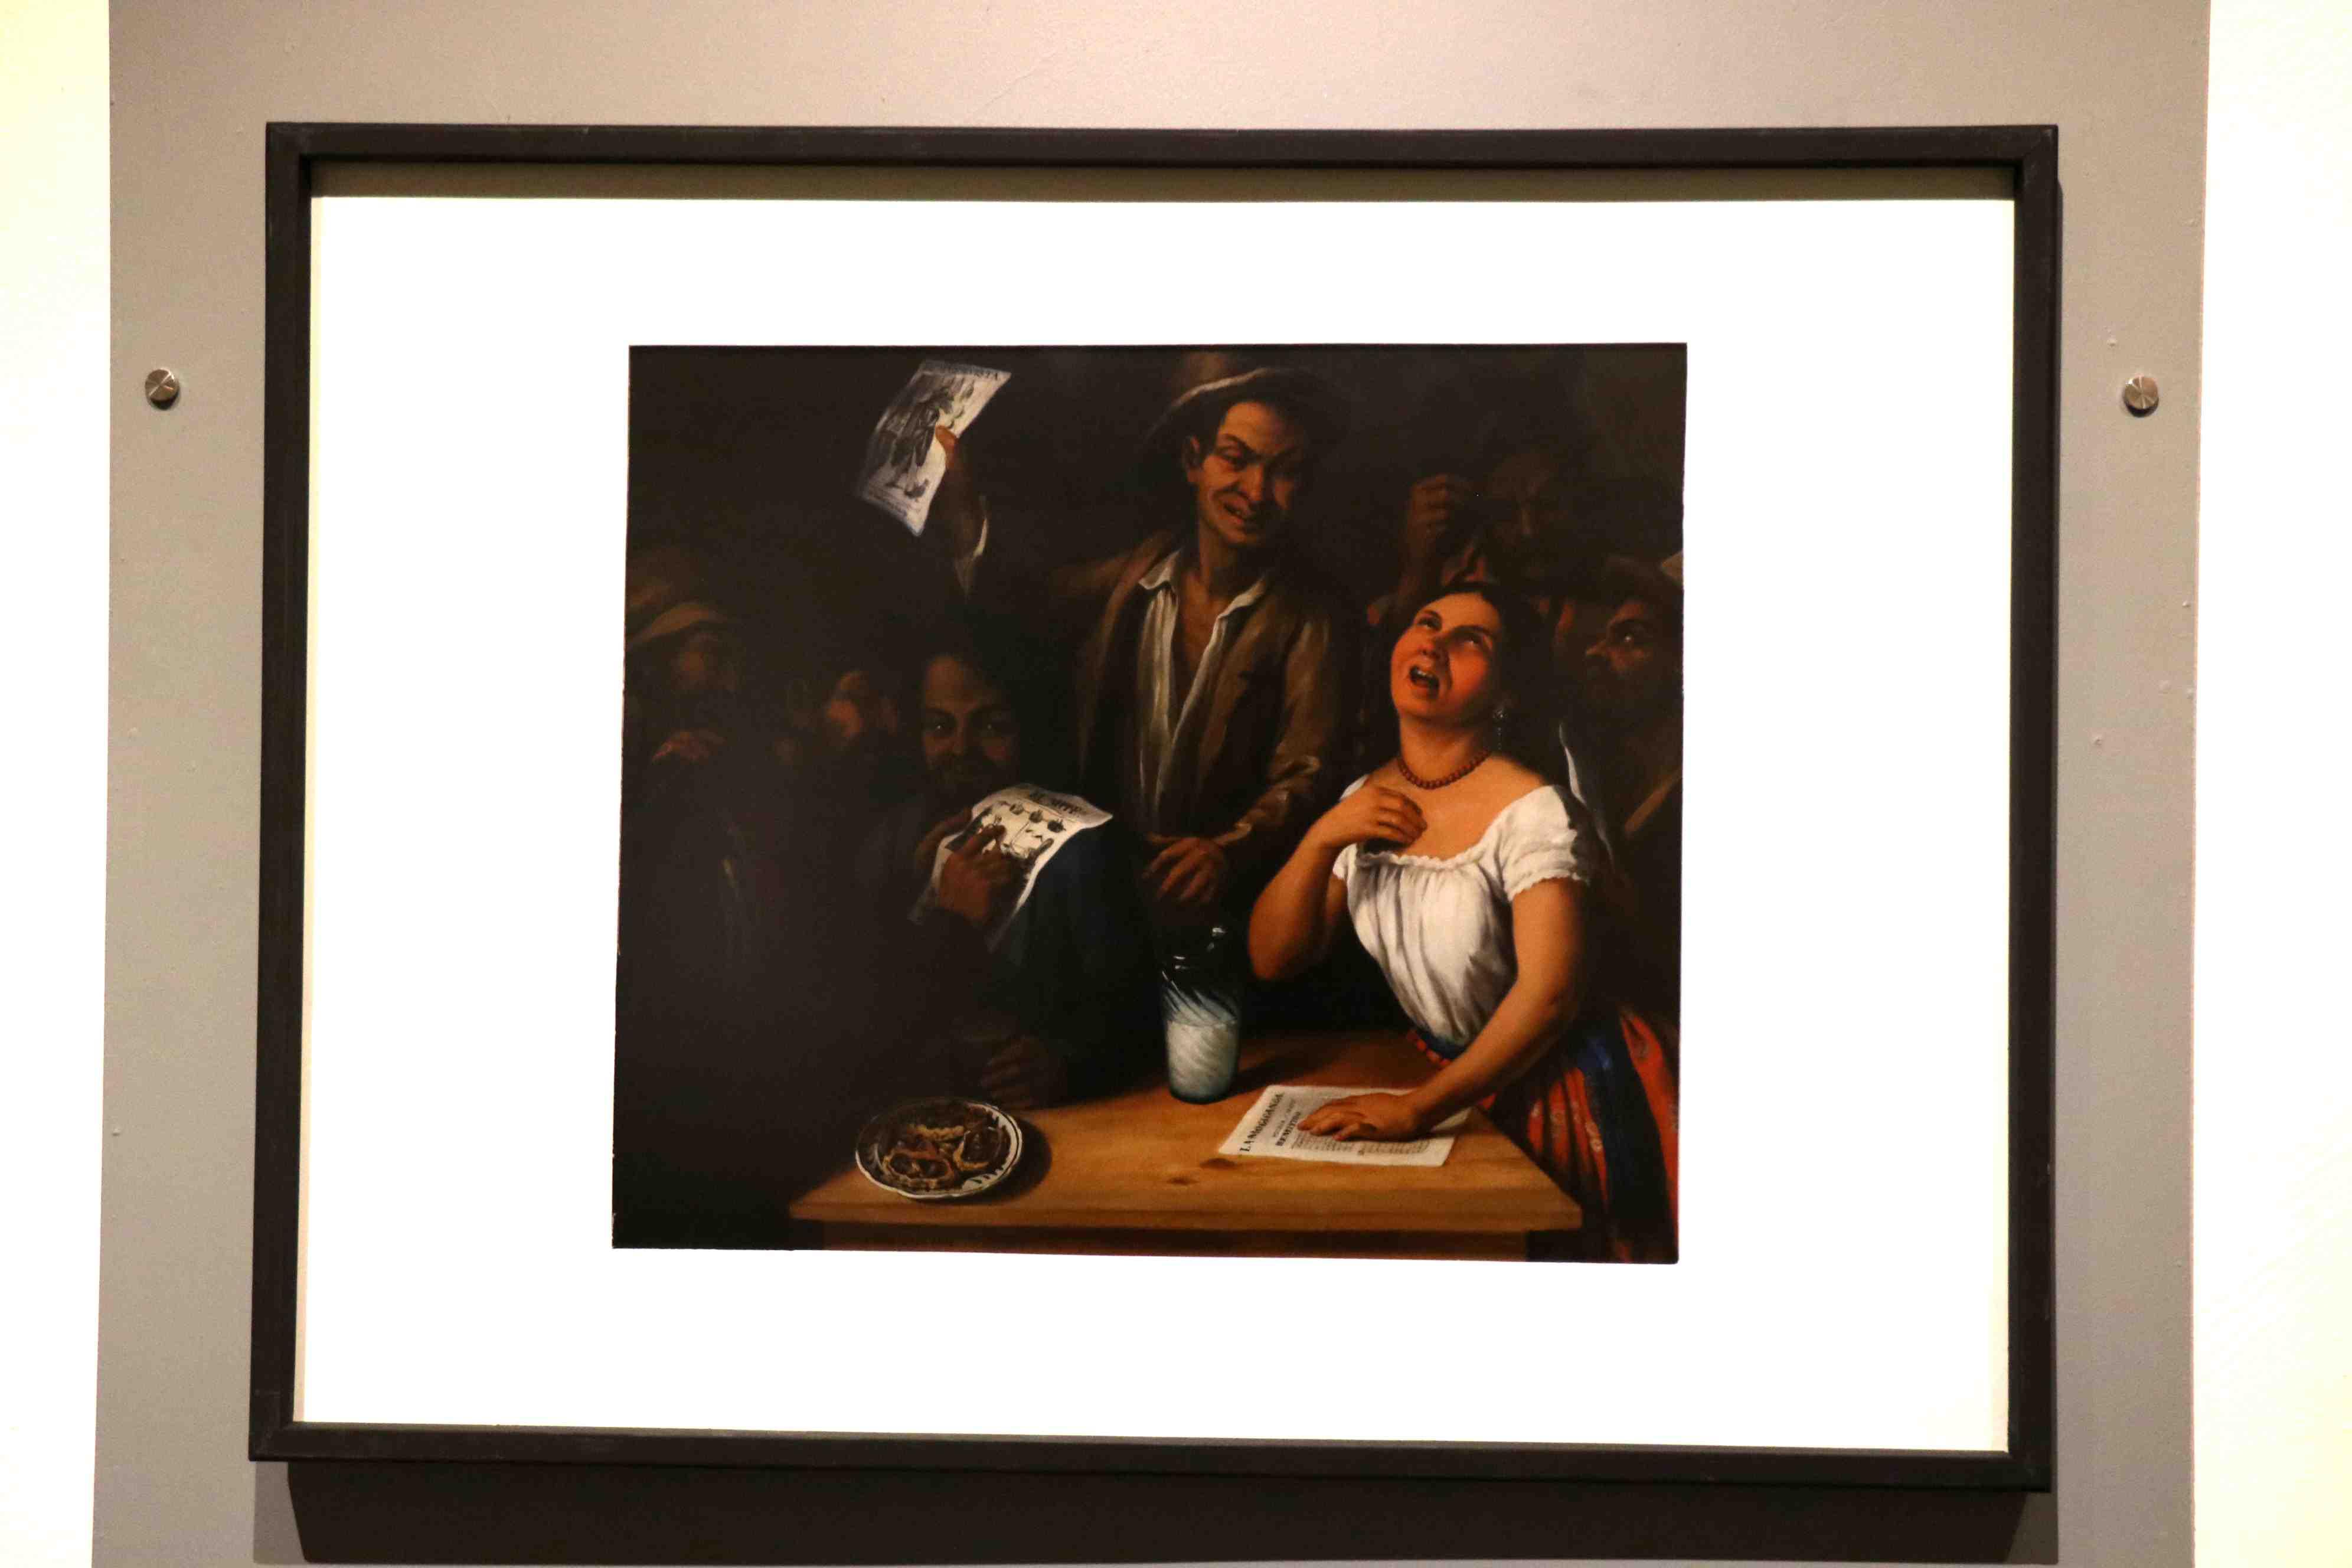 Exponen obra de Arrieta en el Museo UPAEP